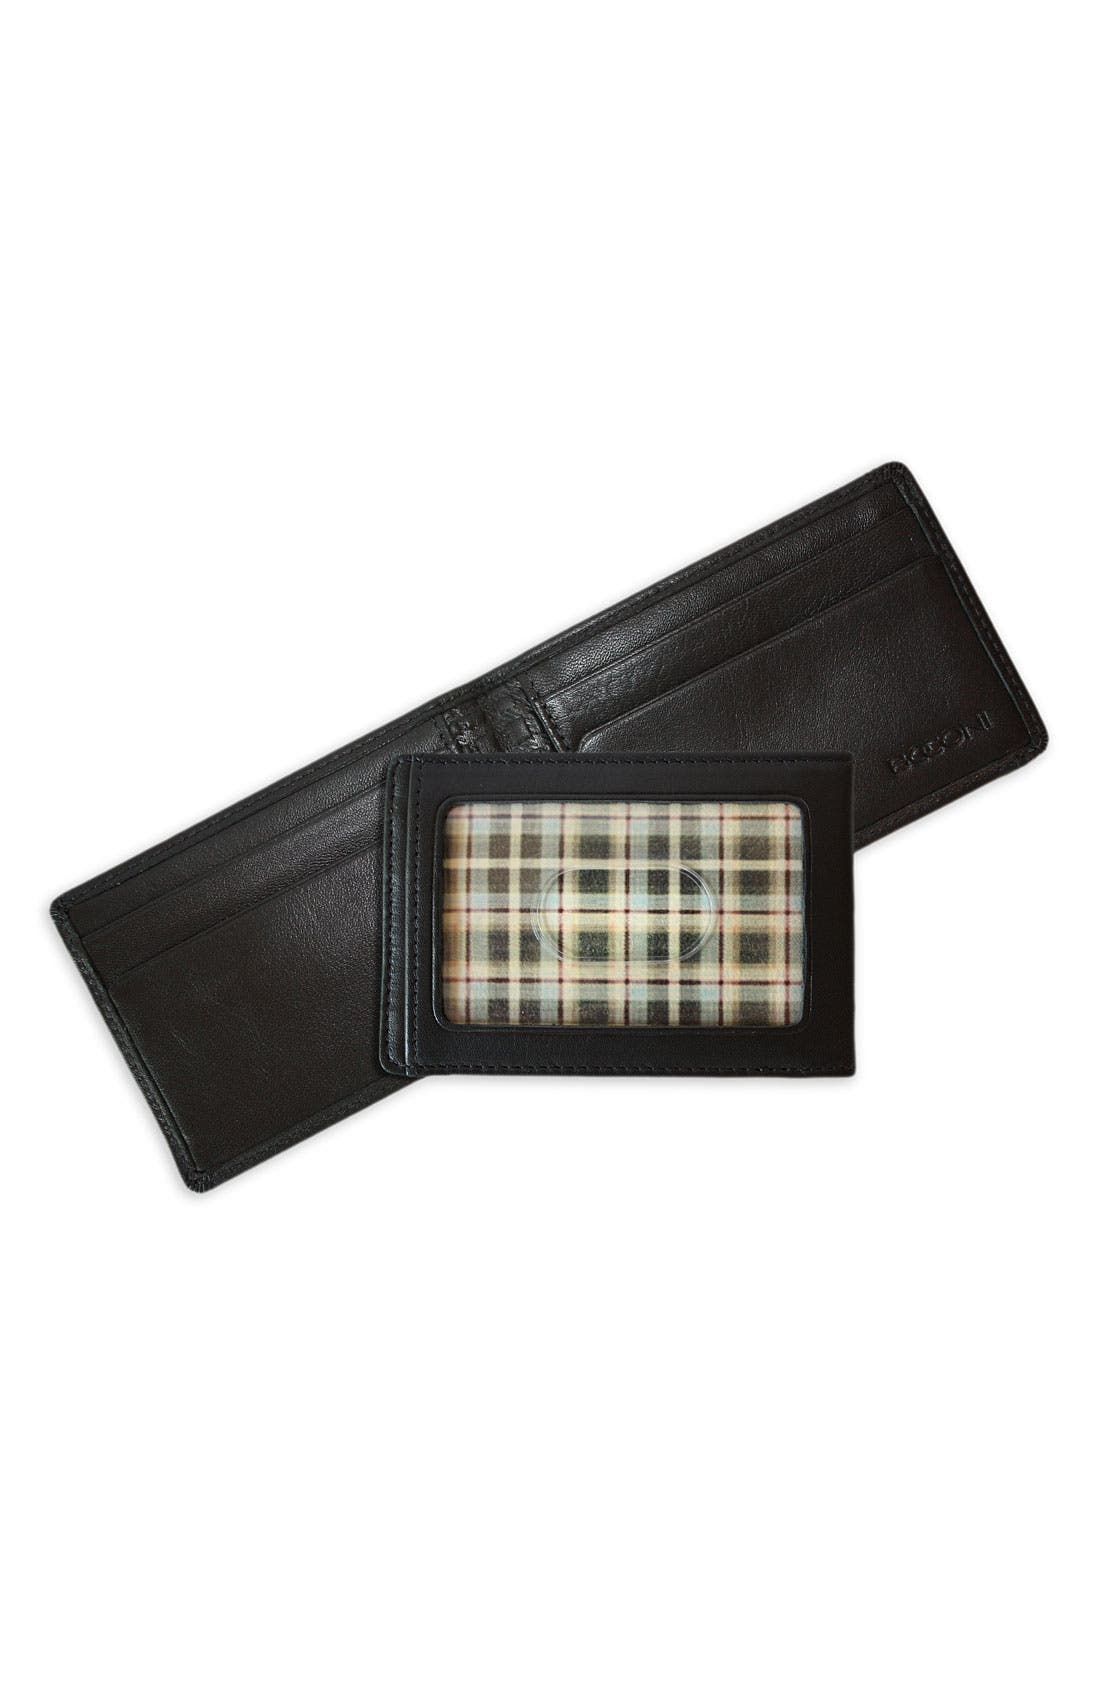 Alternate Image 1 Selected - Boconi Leather Money Clip Wallet